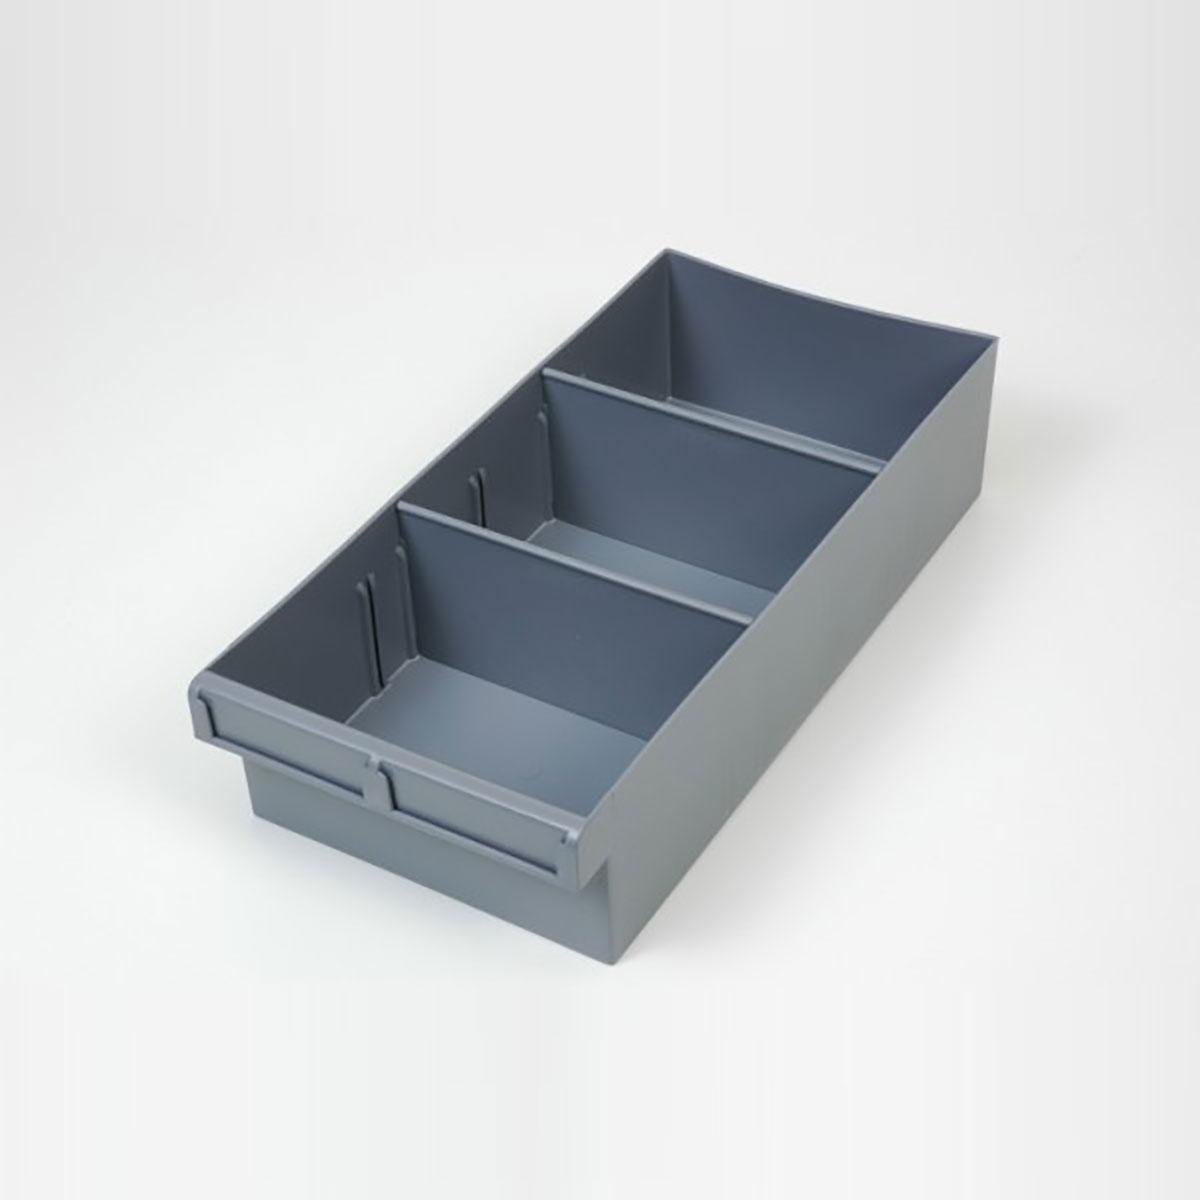 600mm deep storage cabinets